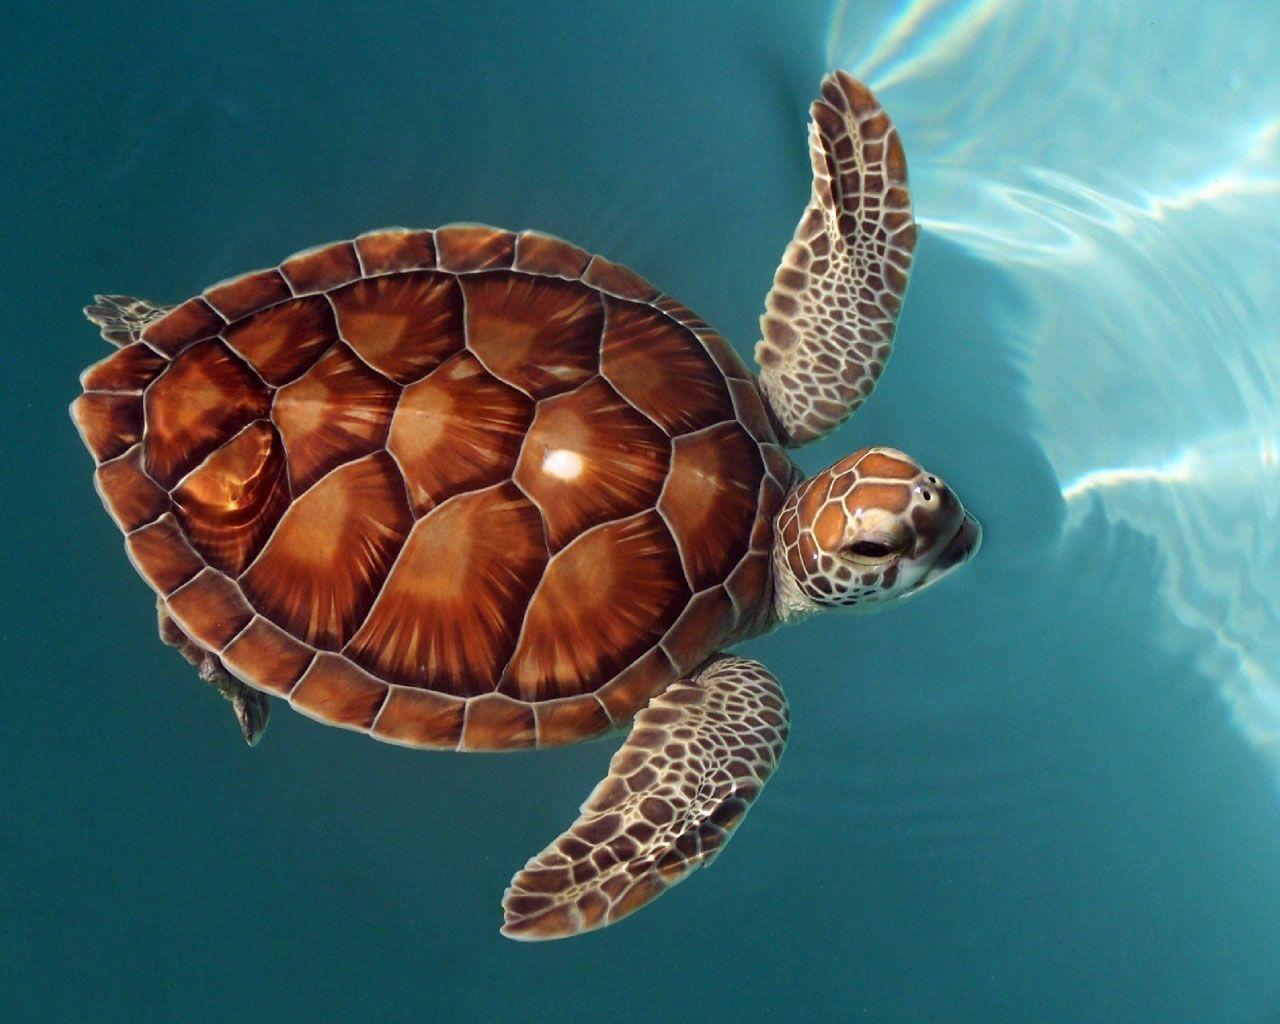 Terrapin Oceanic Turtles High Resolution Wallpaper Download Turtle Photos Free Jpg 1 280 1 024 Pixeles Ocean Turtle Turtle Sea Turtle Art